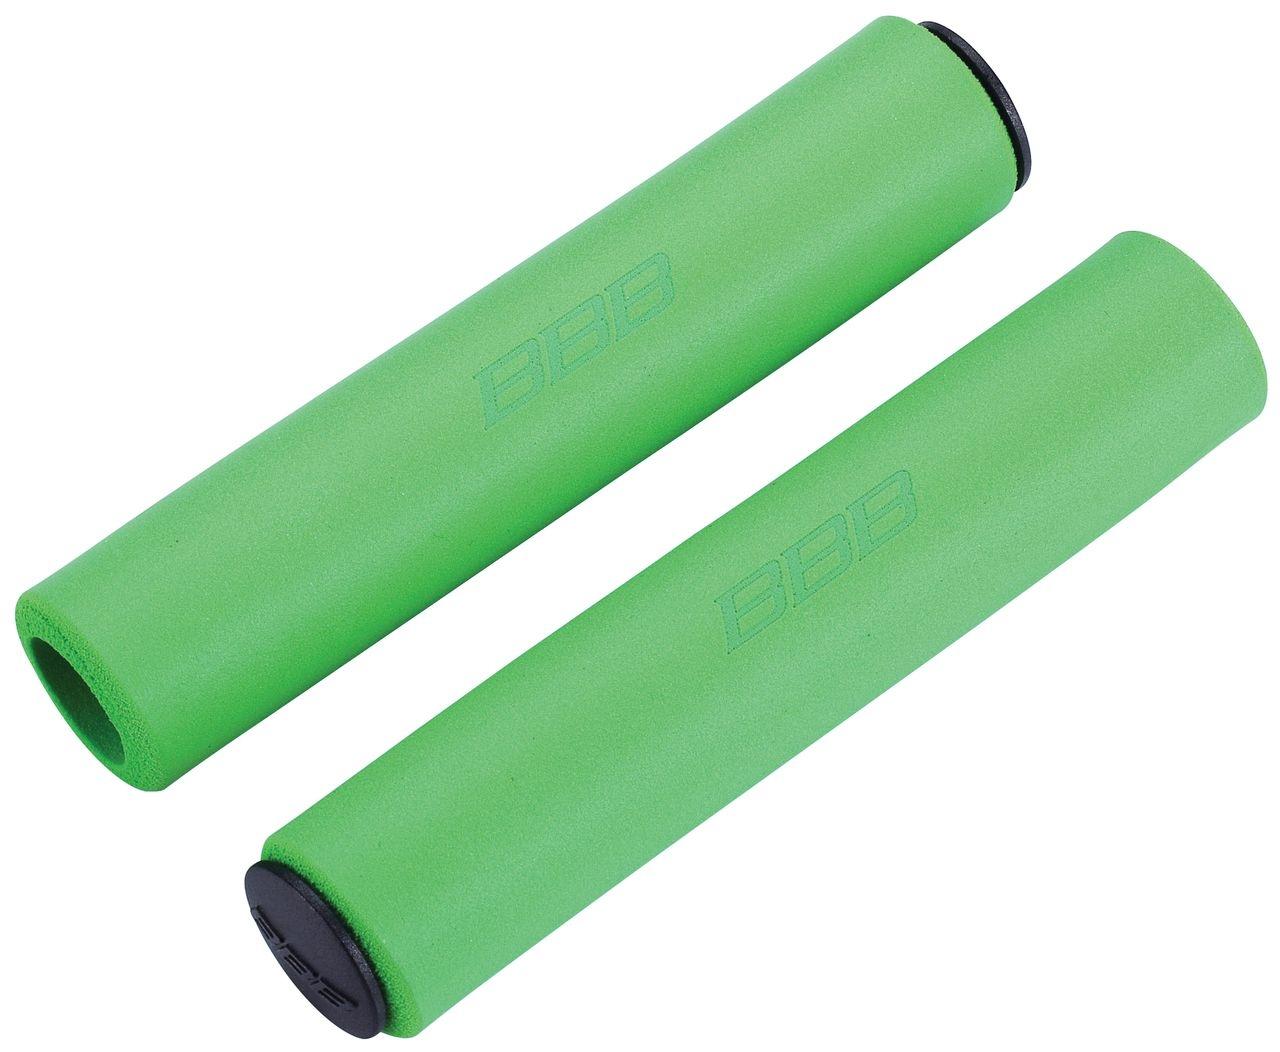 Poignées BBB Sticky 130 mm (vert) - BHG-34